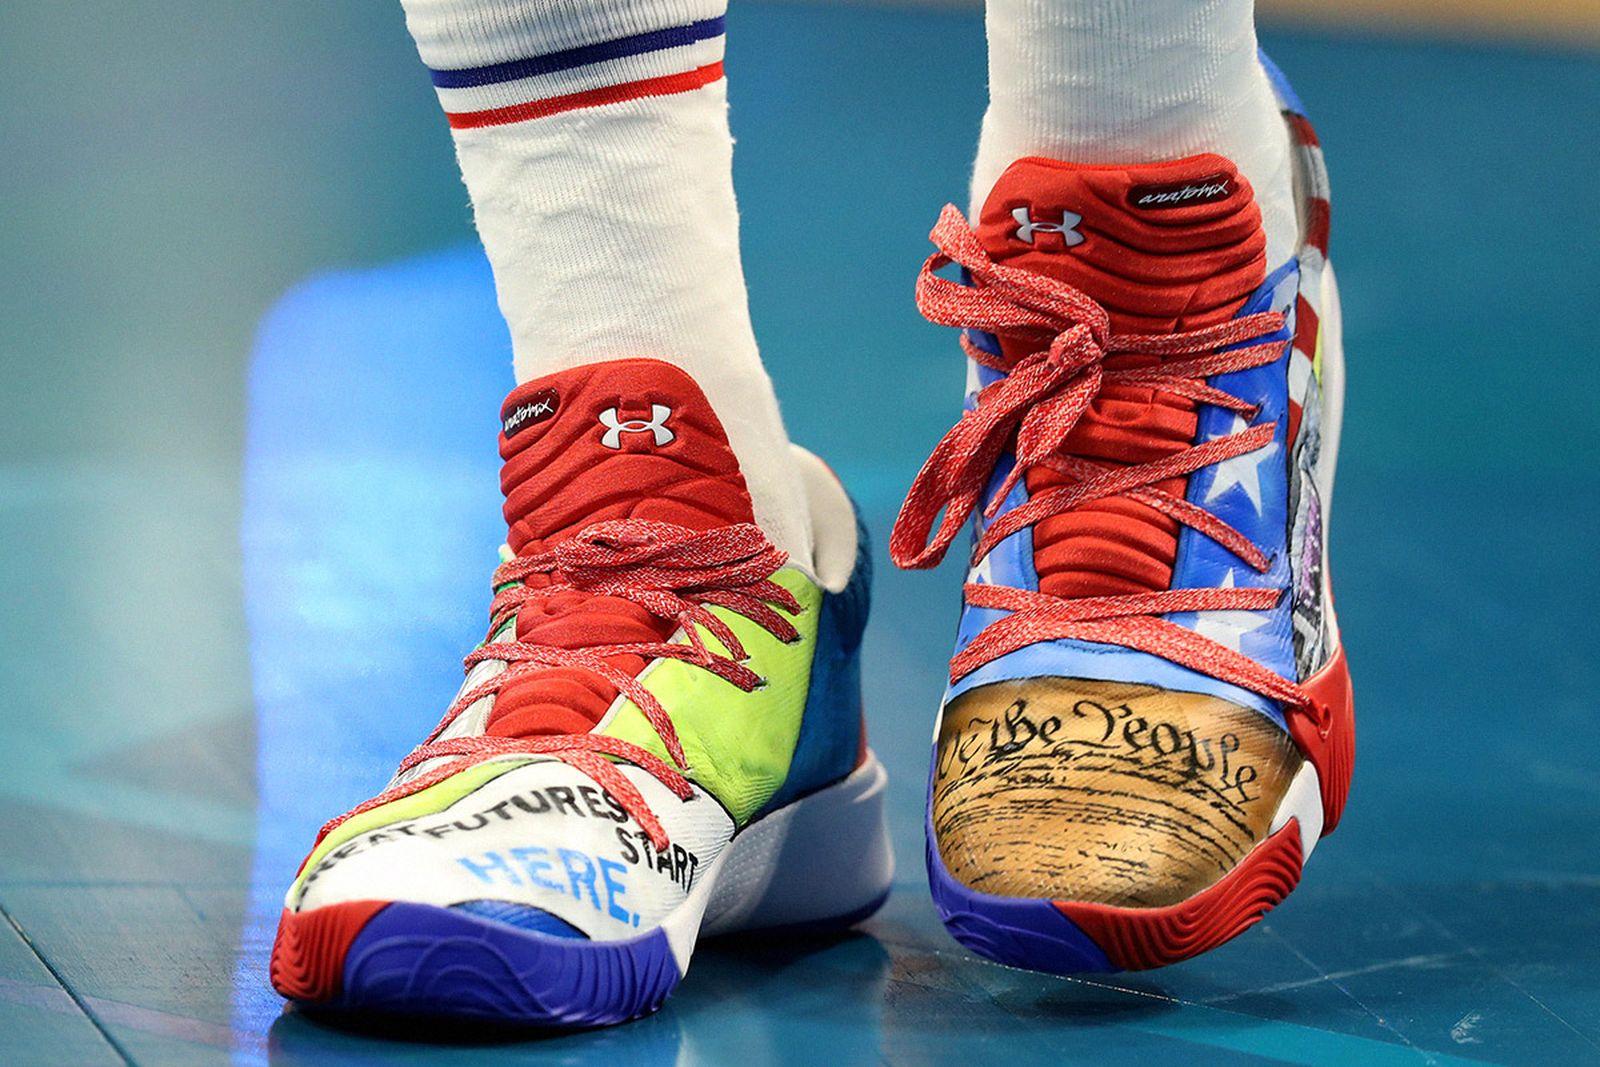 nba star weekend sneakers roundup Adidas NBA All Star Game New Balance